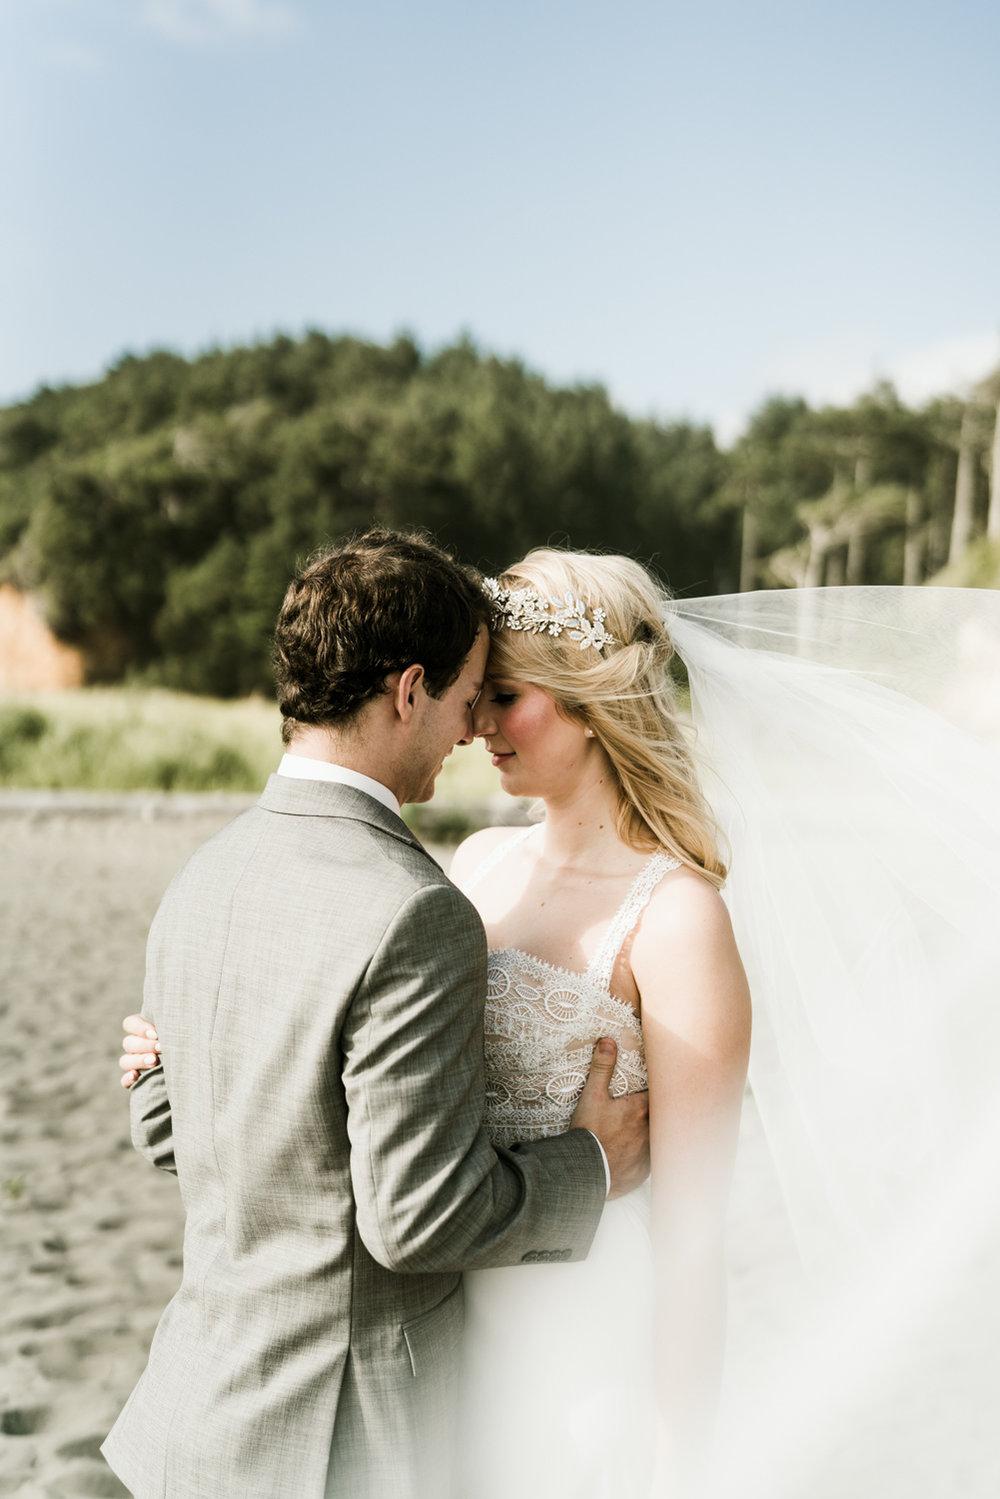 April Yentas Photography - Seabrook Shoot-69.jpg